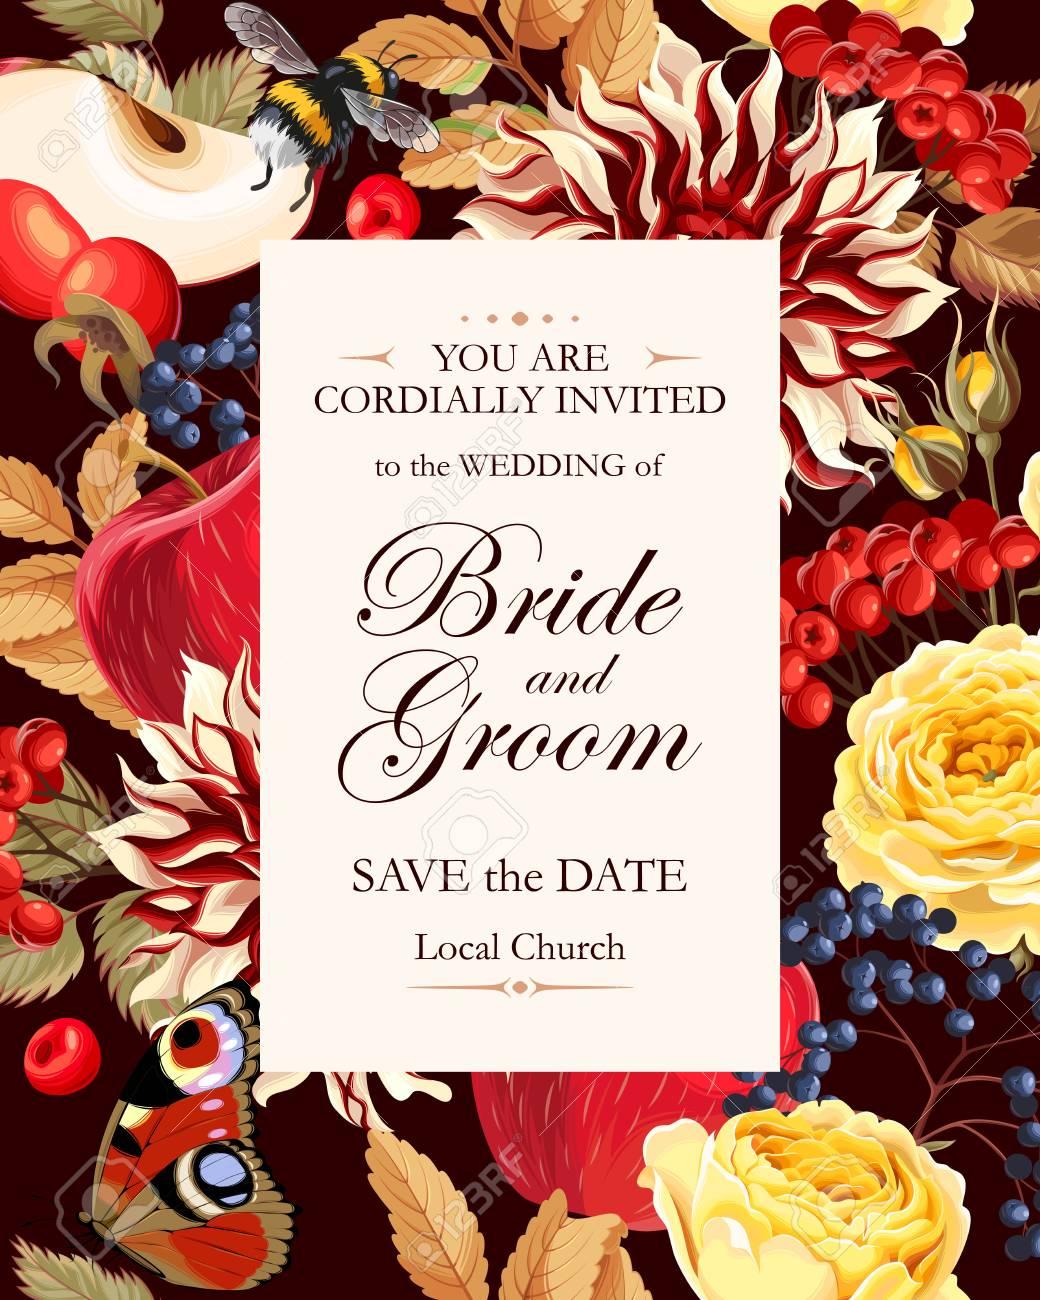 Vintage Wedding Invitation Royalty Free Cliparts, Vectors, And Stock ...